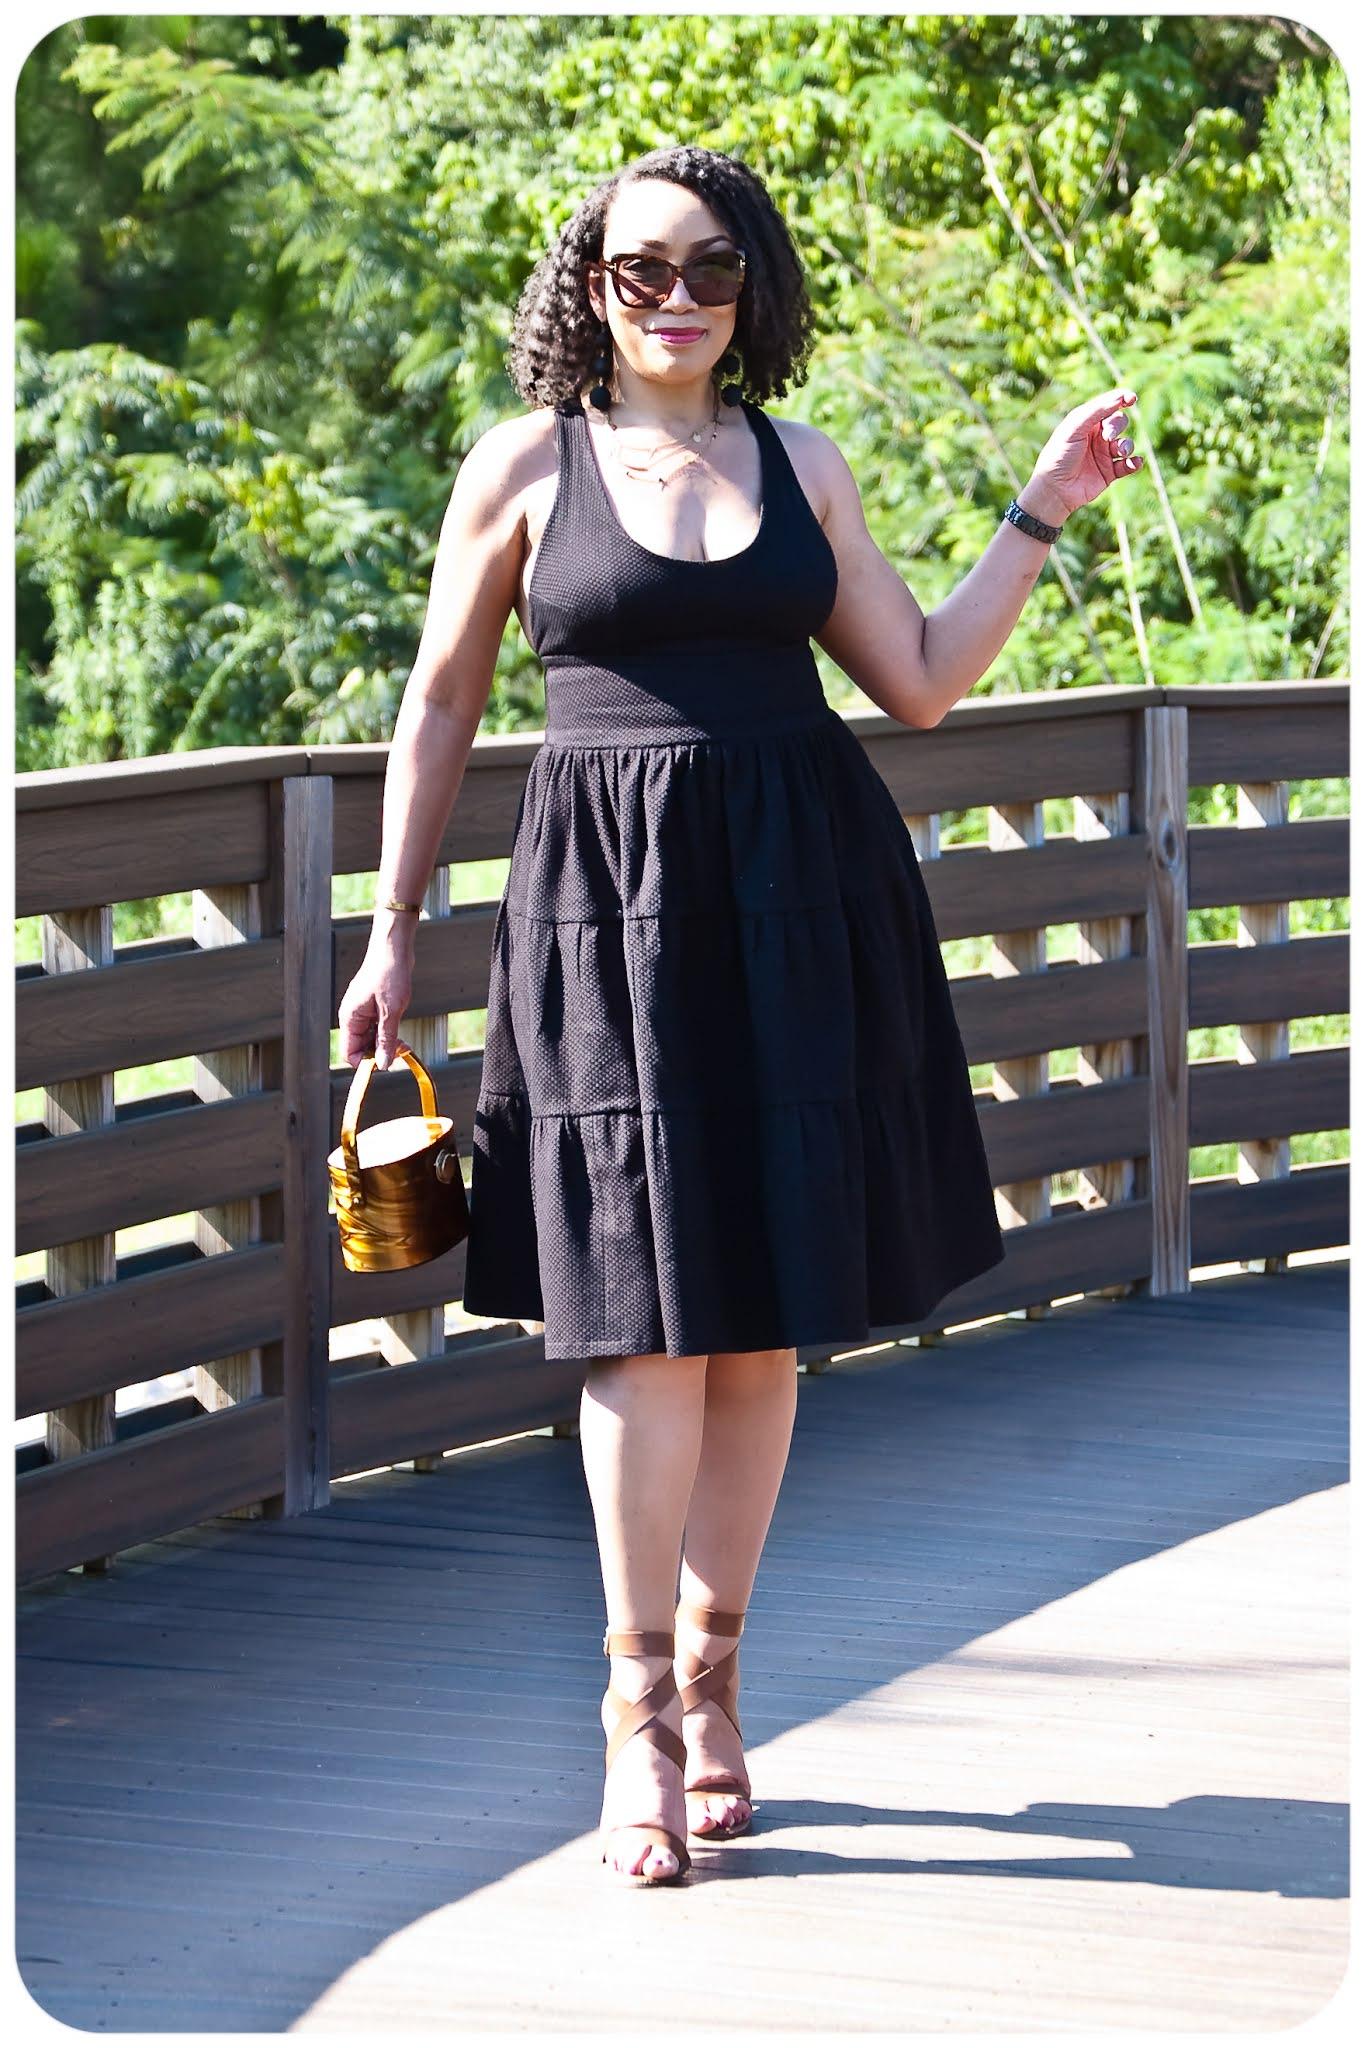 Black Tiered Crossback Sundress - Erica Bunker DIY Style!